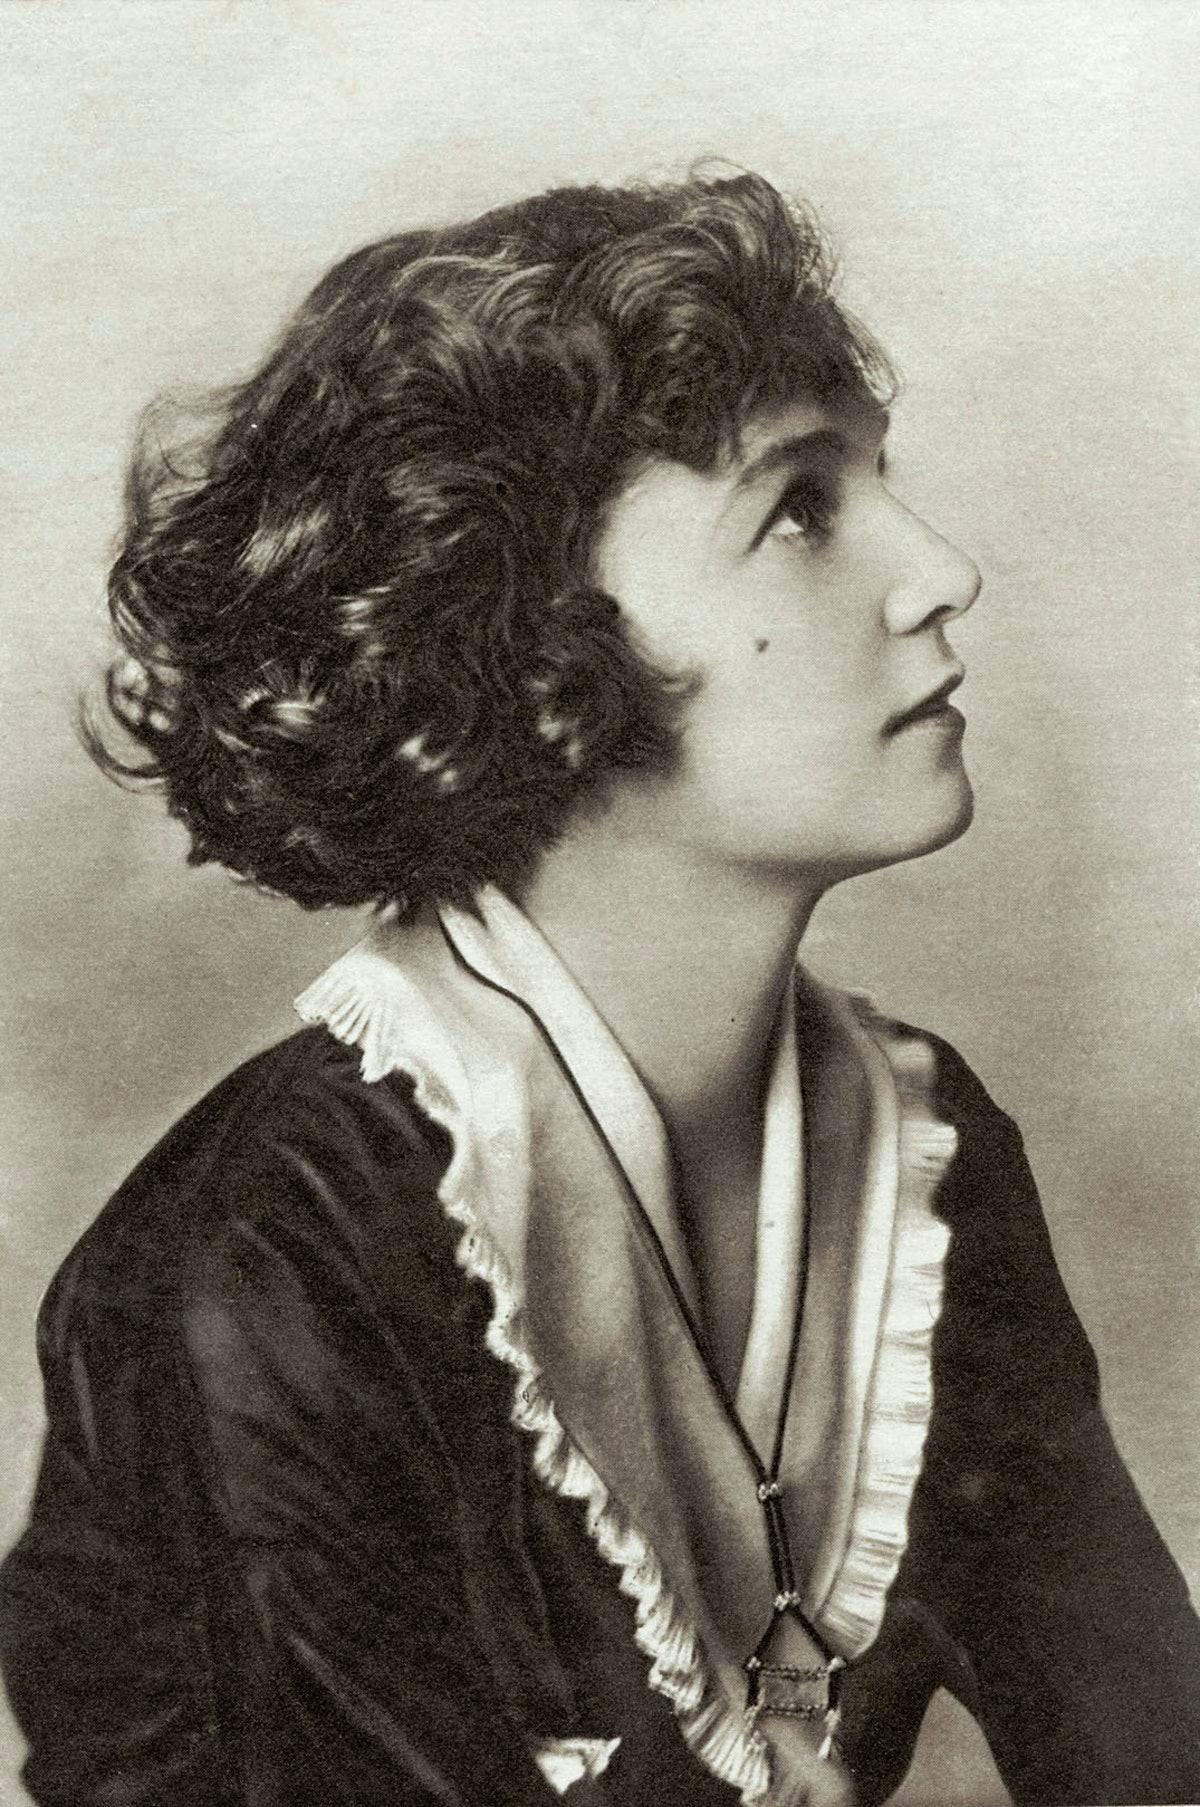 Irene Castle epitomizes the 1920s flapper girl bob.